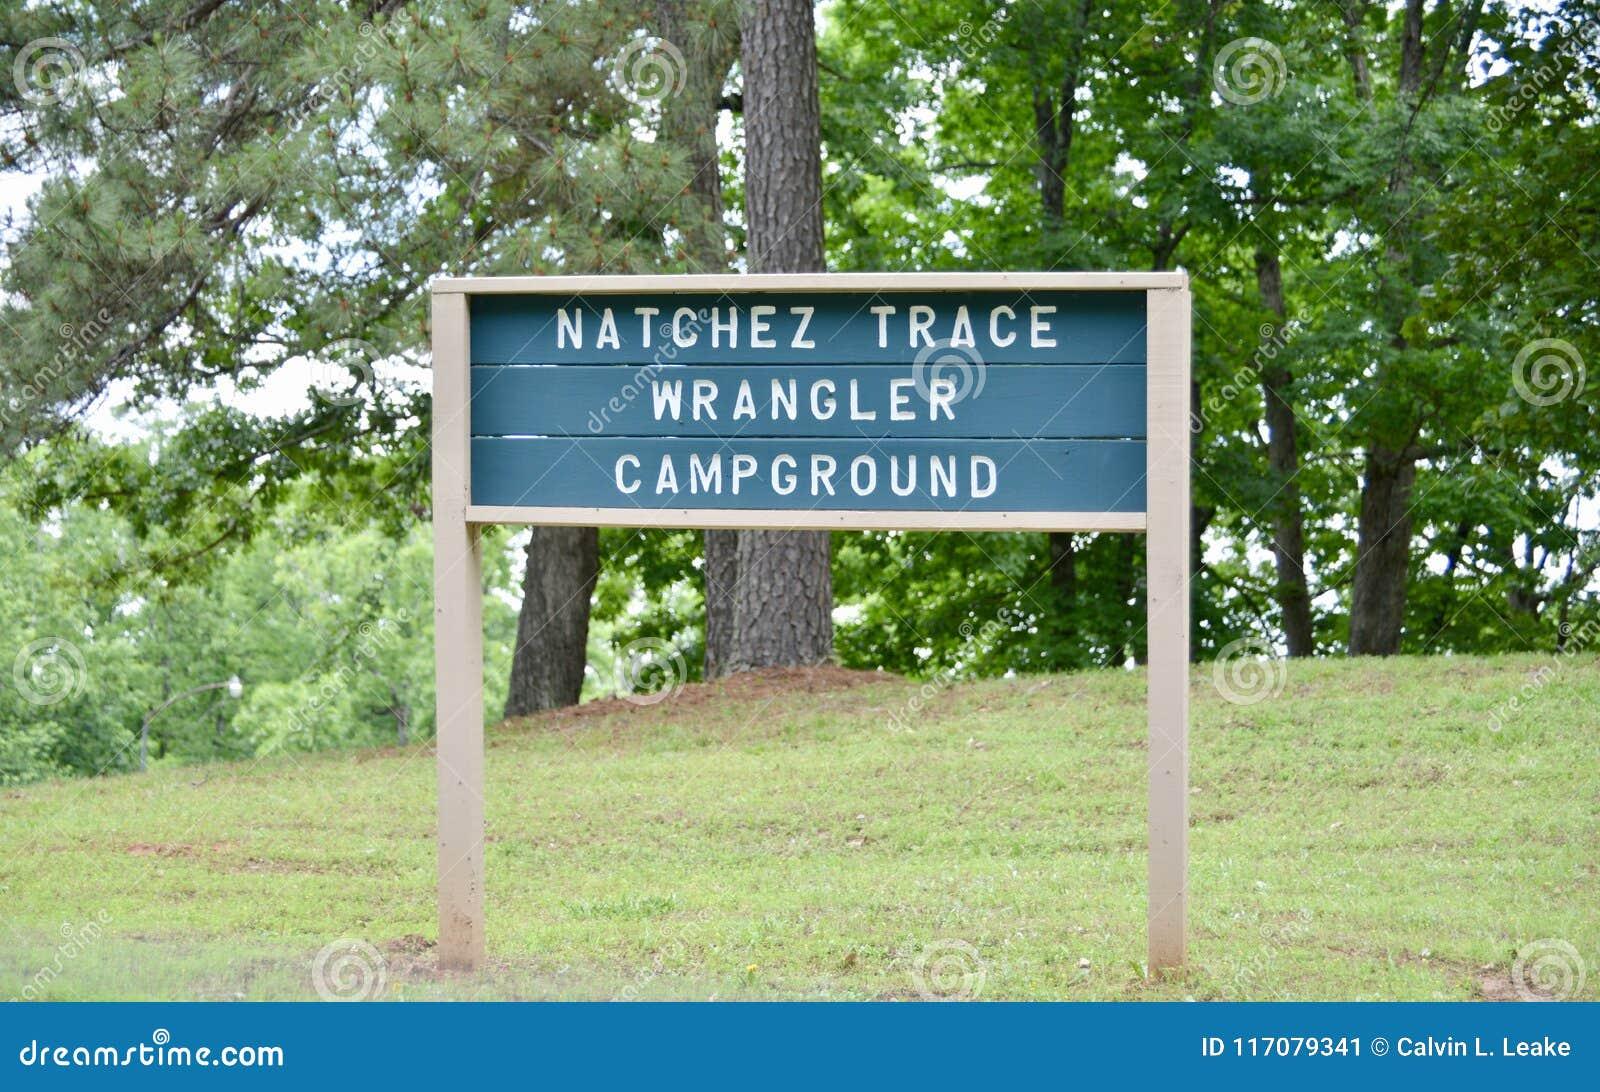 Natchez Trace Park Wrangler Campground